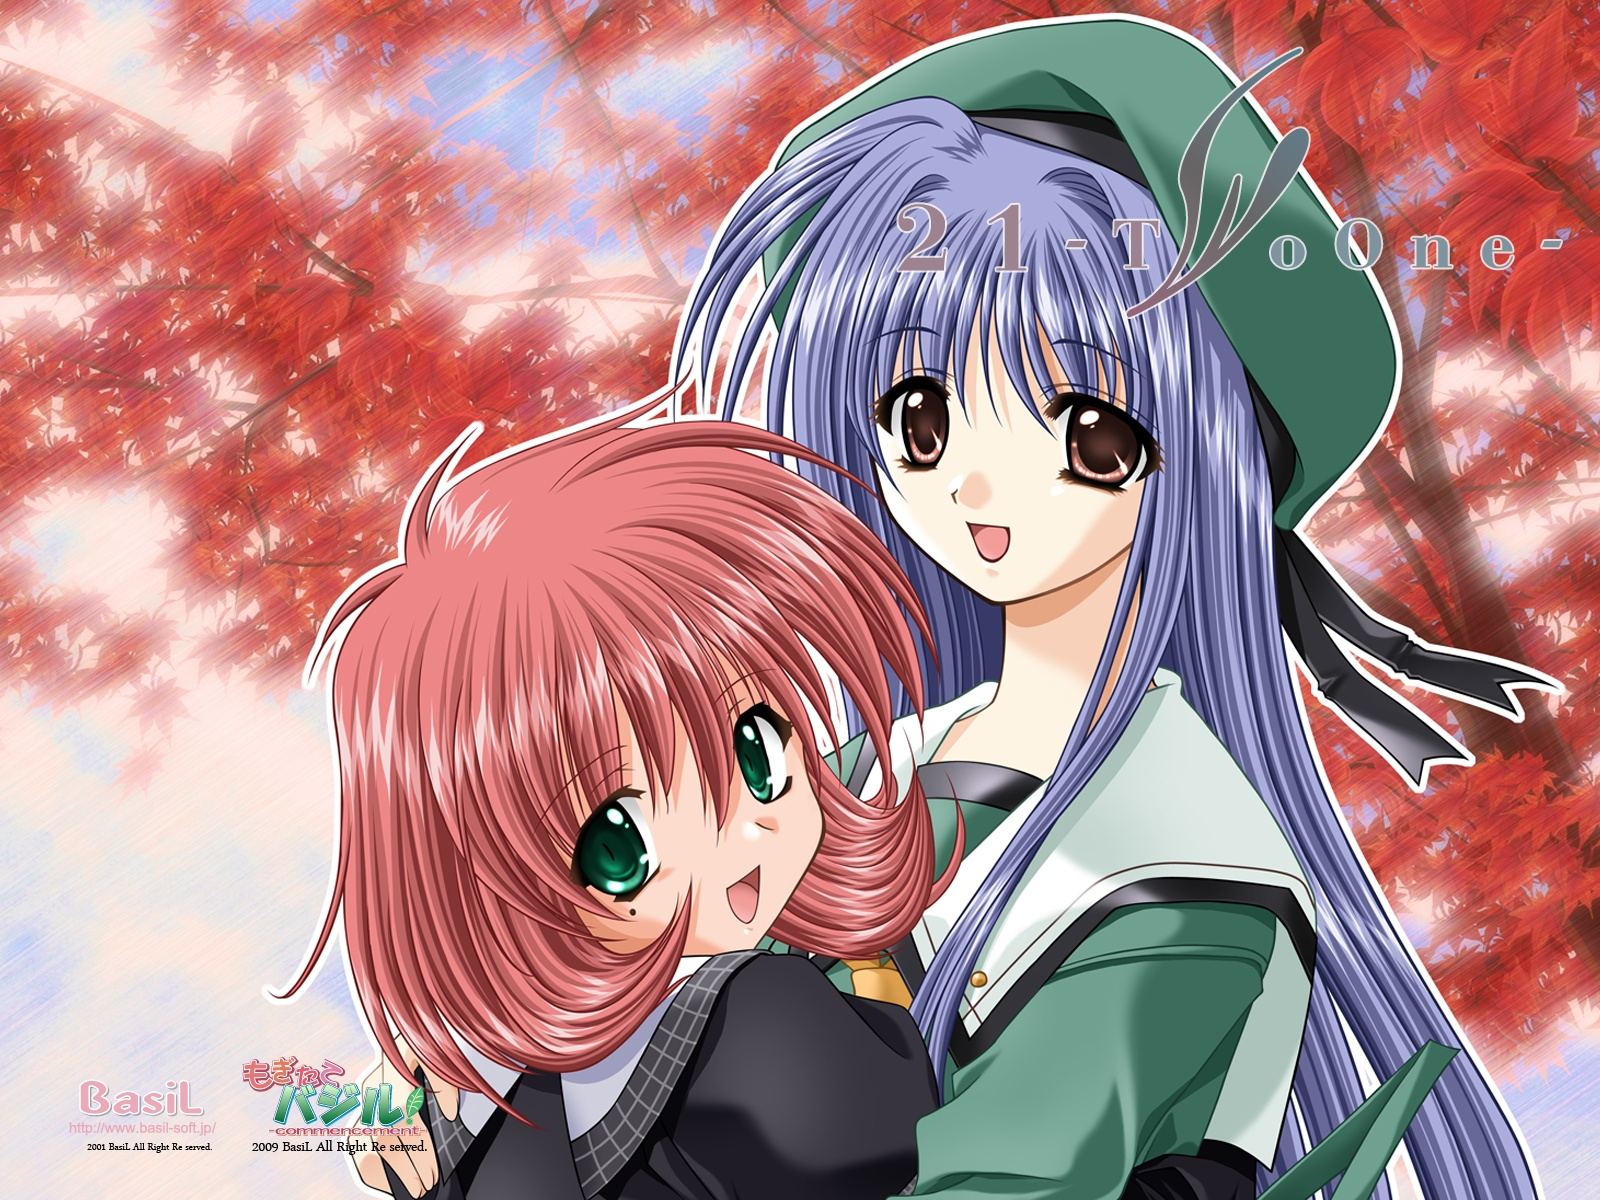 21 blue_hair brown_eyes futami_mio green_eyes ichinose_konoha long_hair pink_hair school_uniform short_hair